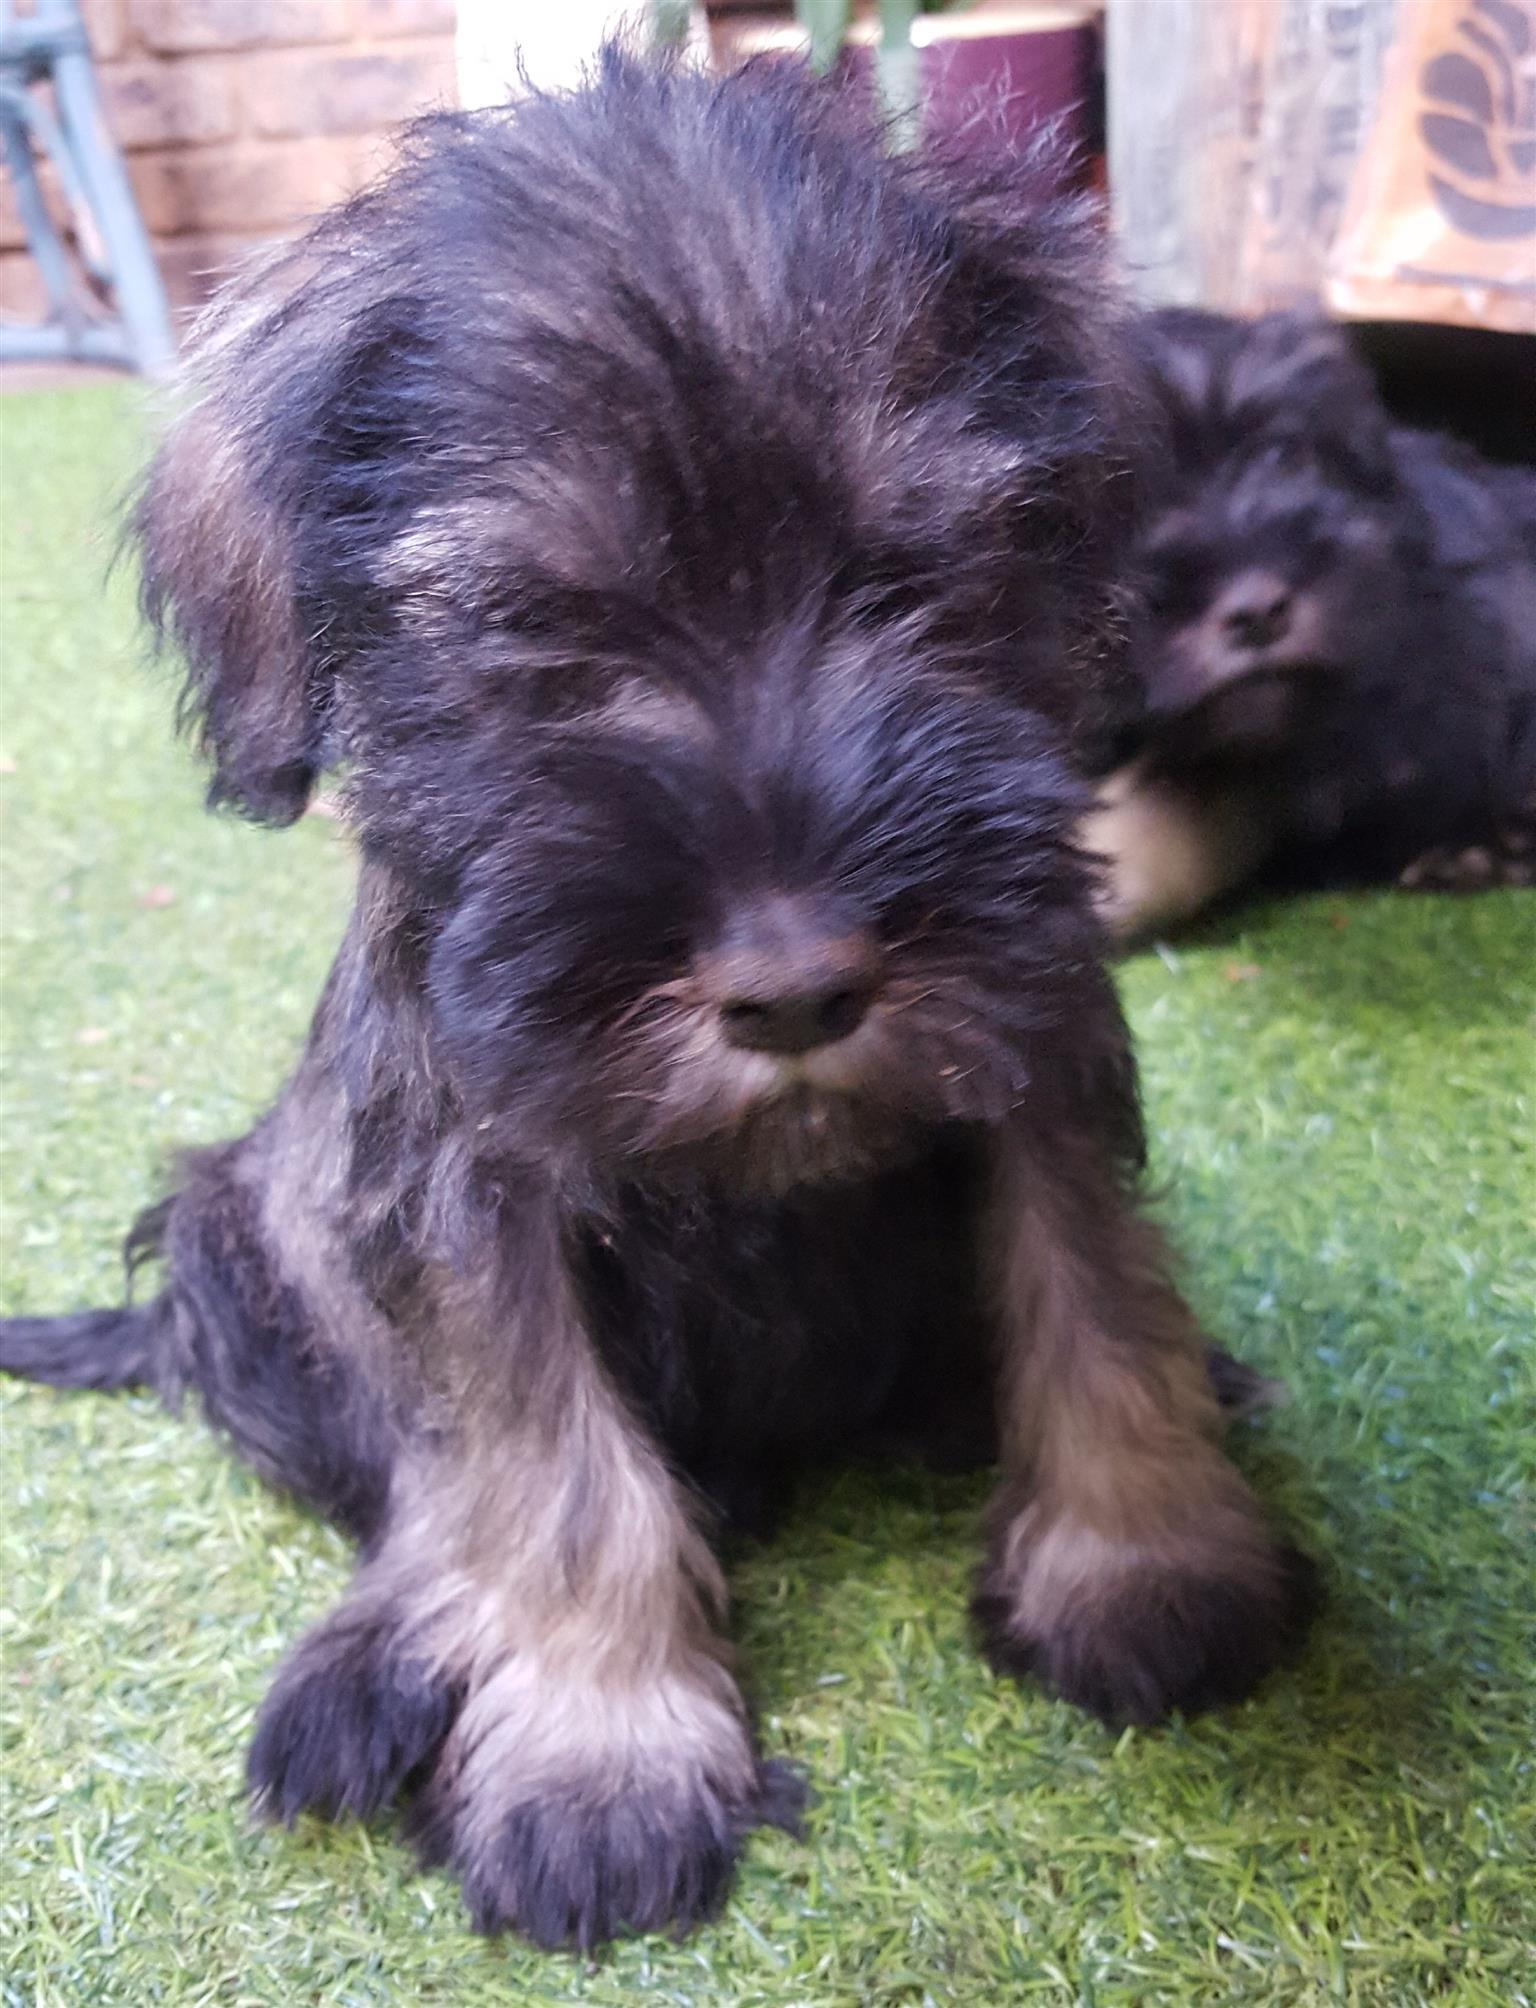 Adorable Miniature Schnauzer Puppies For Sale